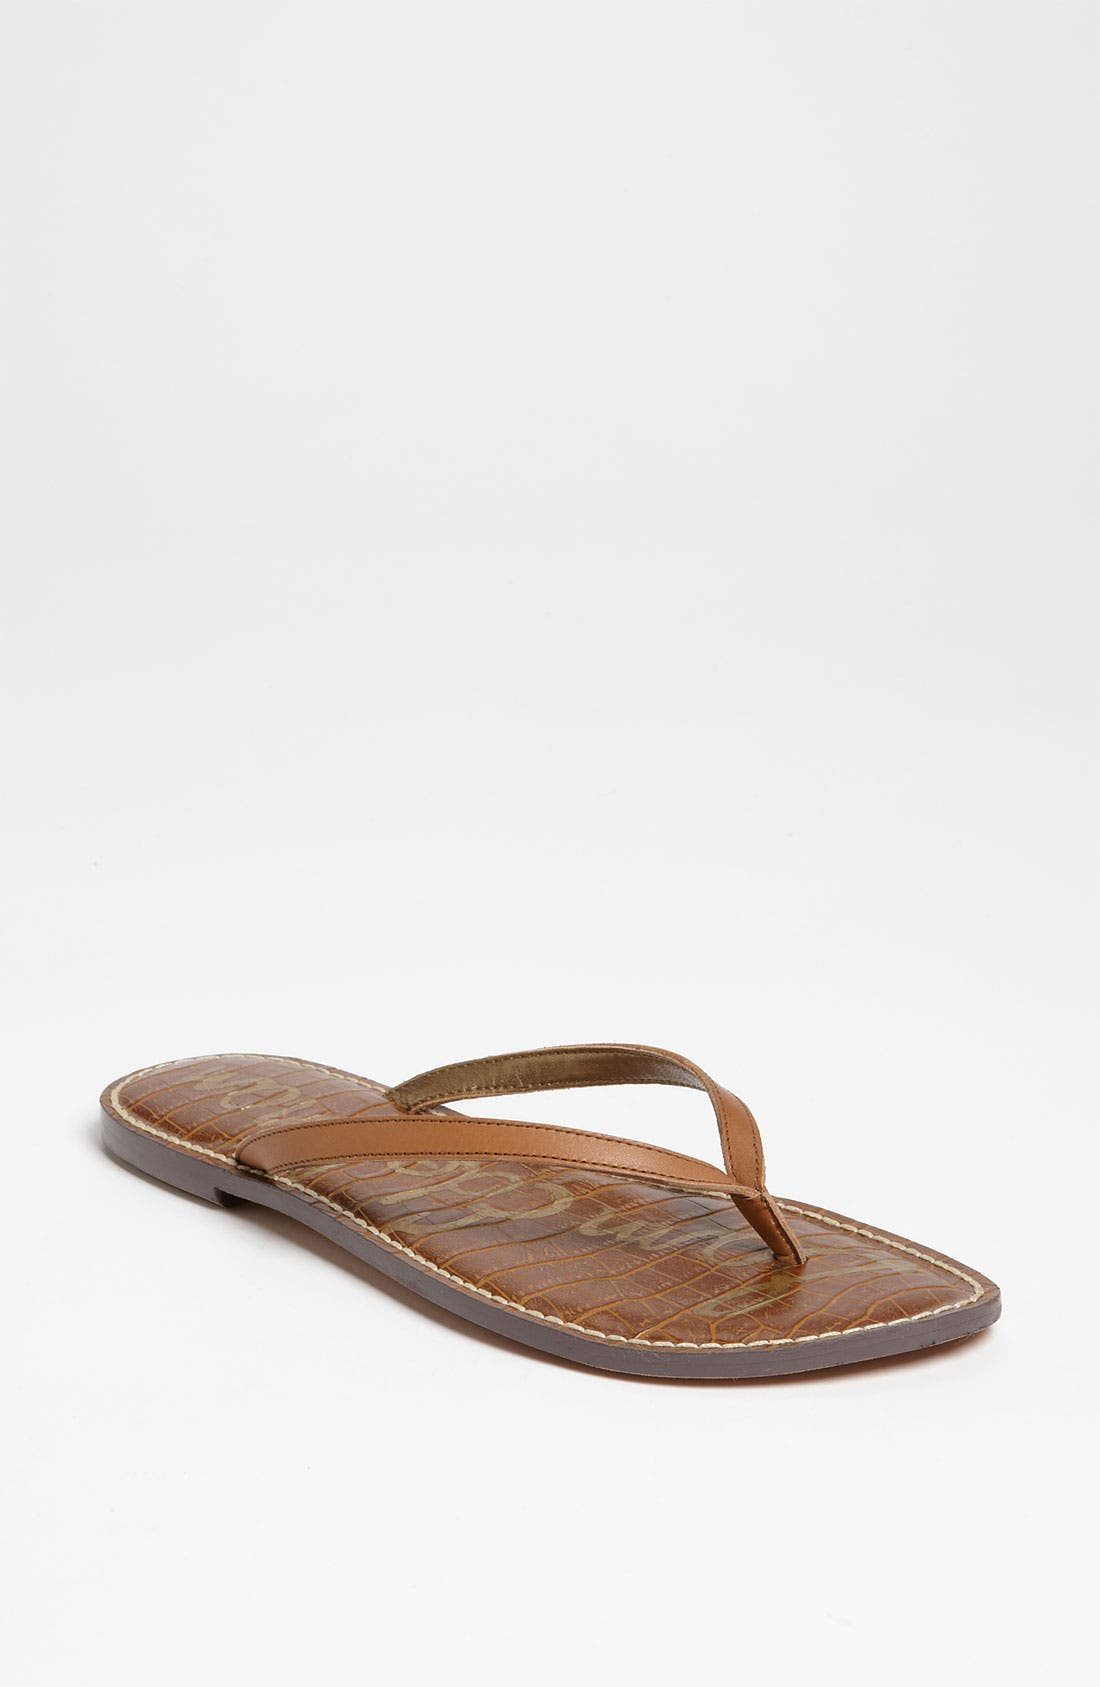 Alternate Image 1 Selected - Sam Edelman 'Gracie' Sandal